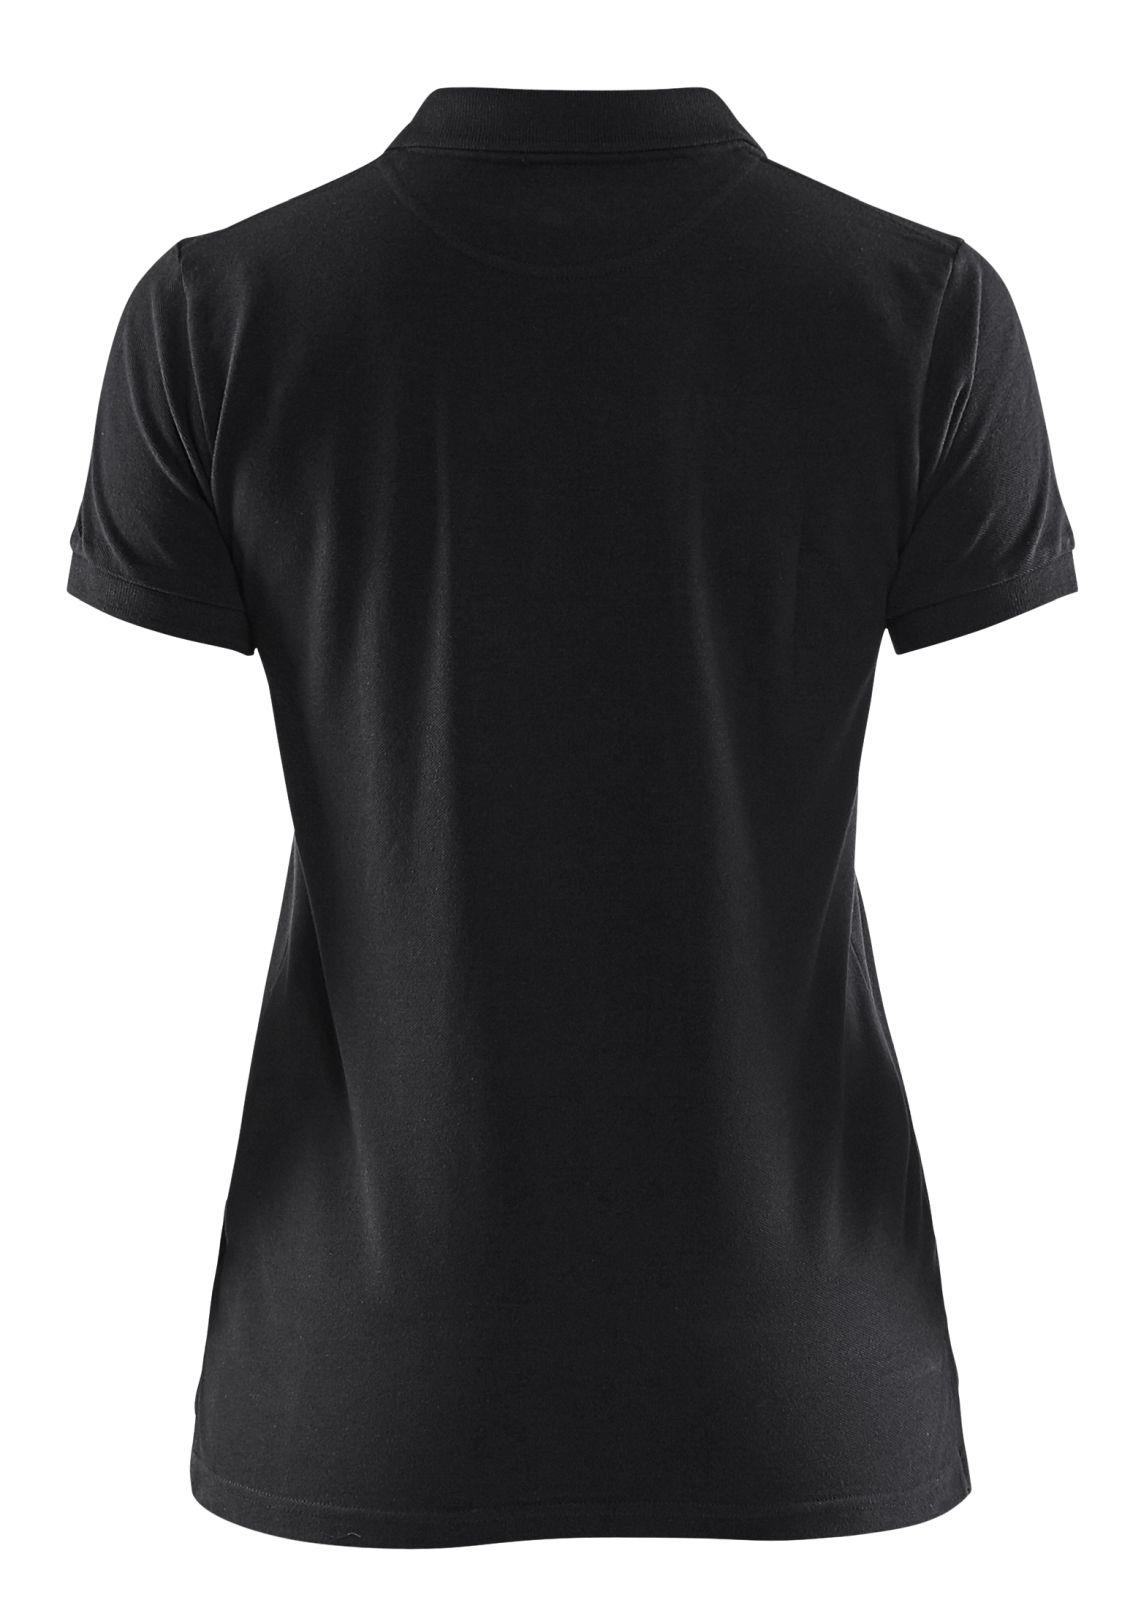 Blaklader Dames polo shirts 33071035 zwart(9900)